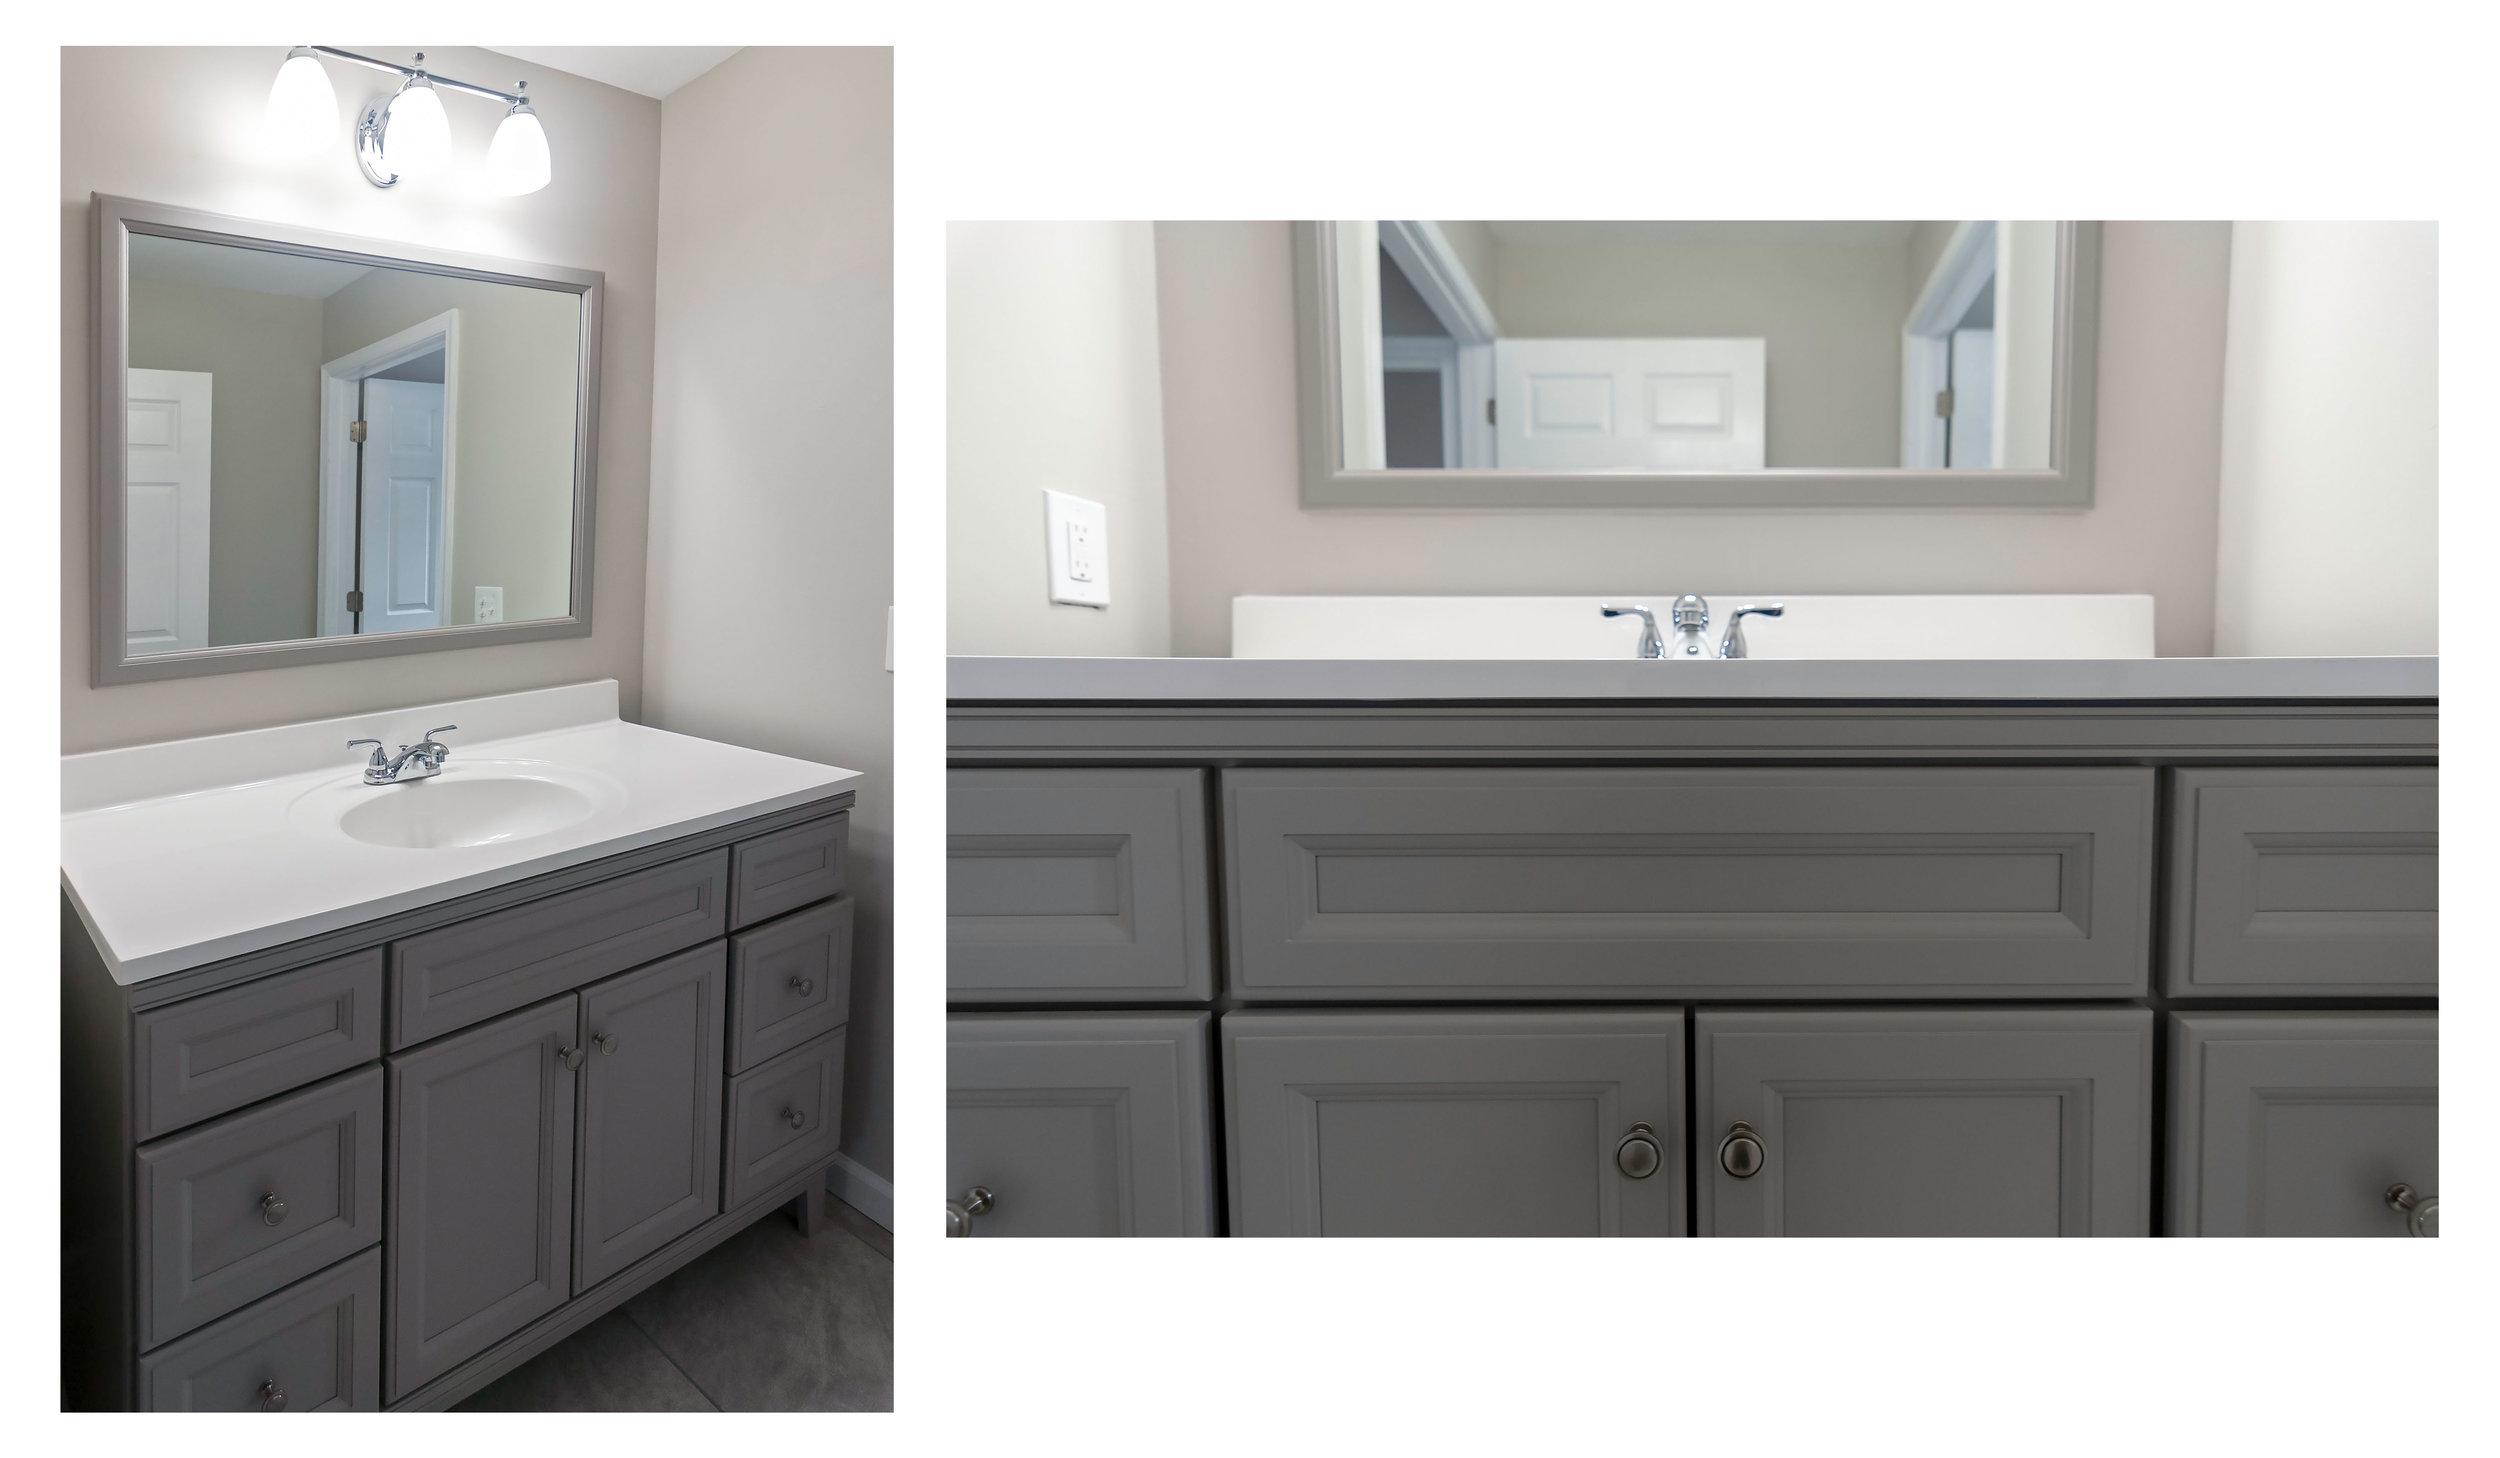 homeland back bathroom collage.jpg